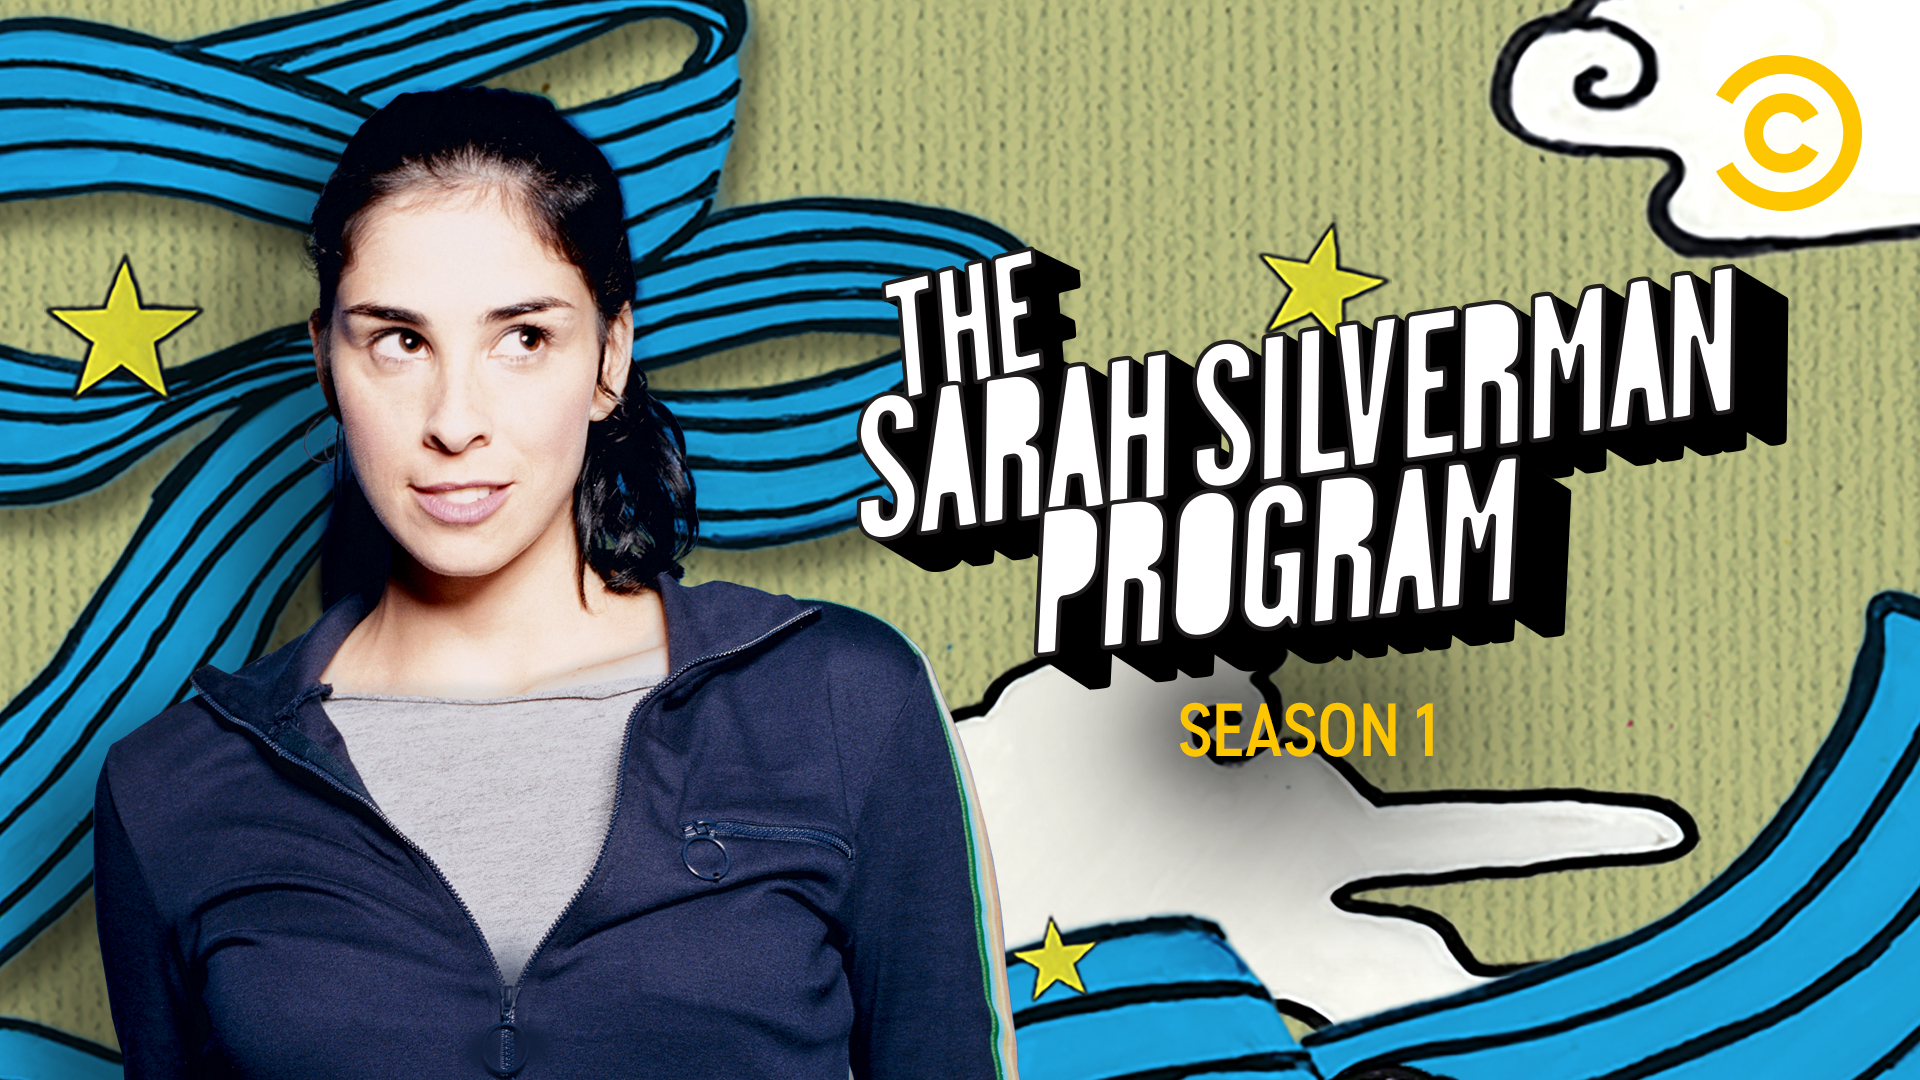 The Sarah Silverman Program Season 1